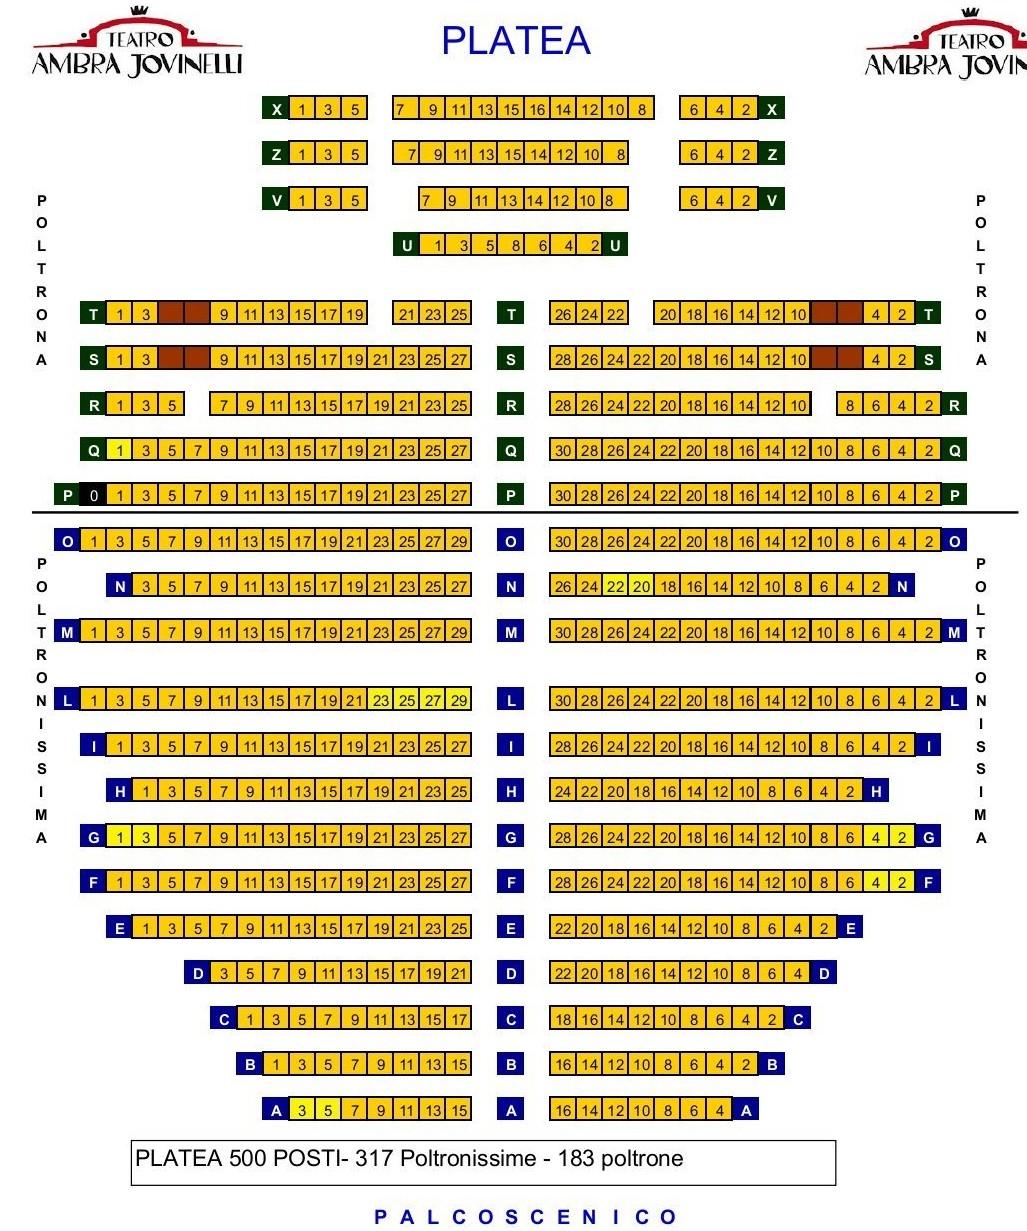 Teatro Ambra Jovinelli Pianta